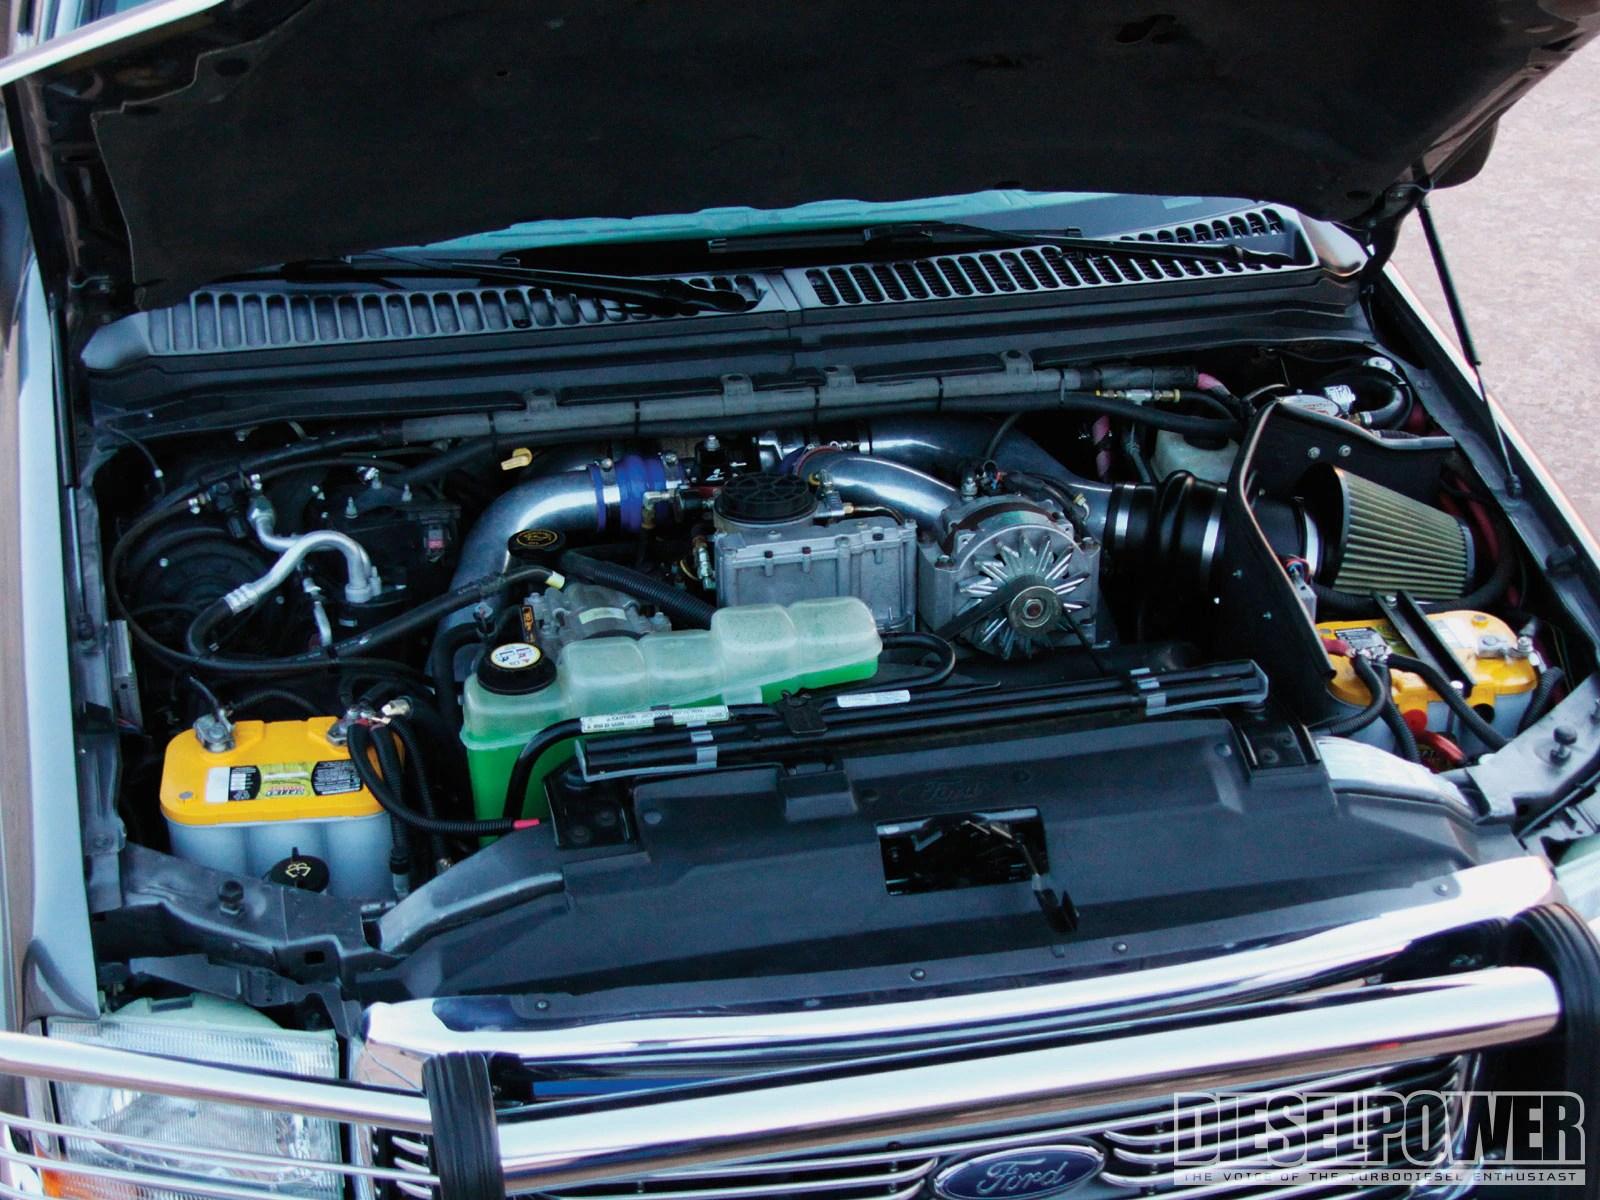 medium resolution of 1012dp 160k dollar ford super duty f550 engine bay